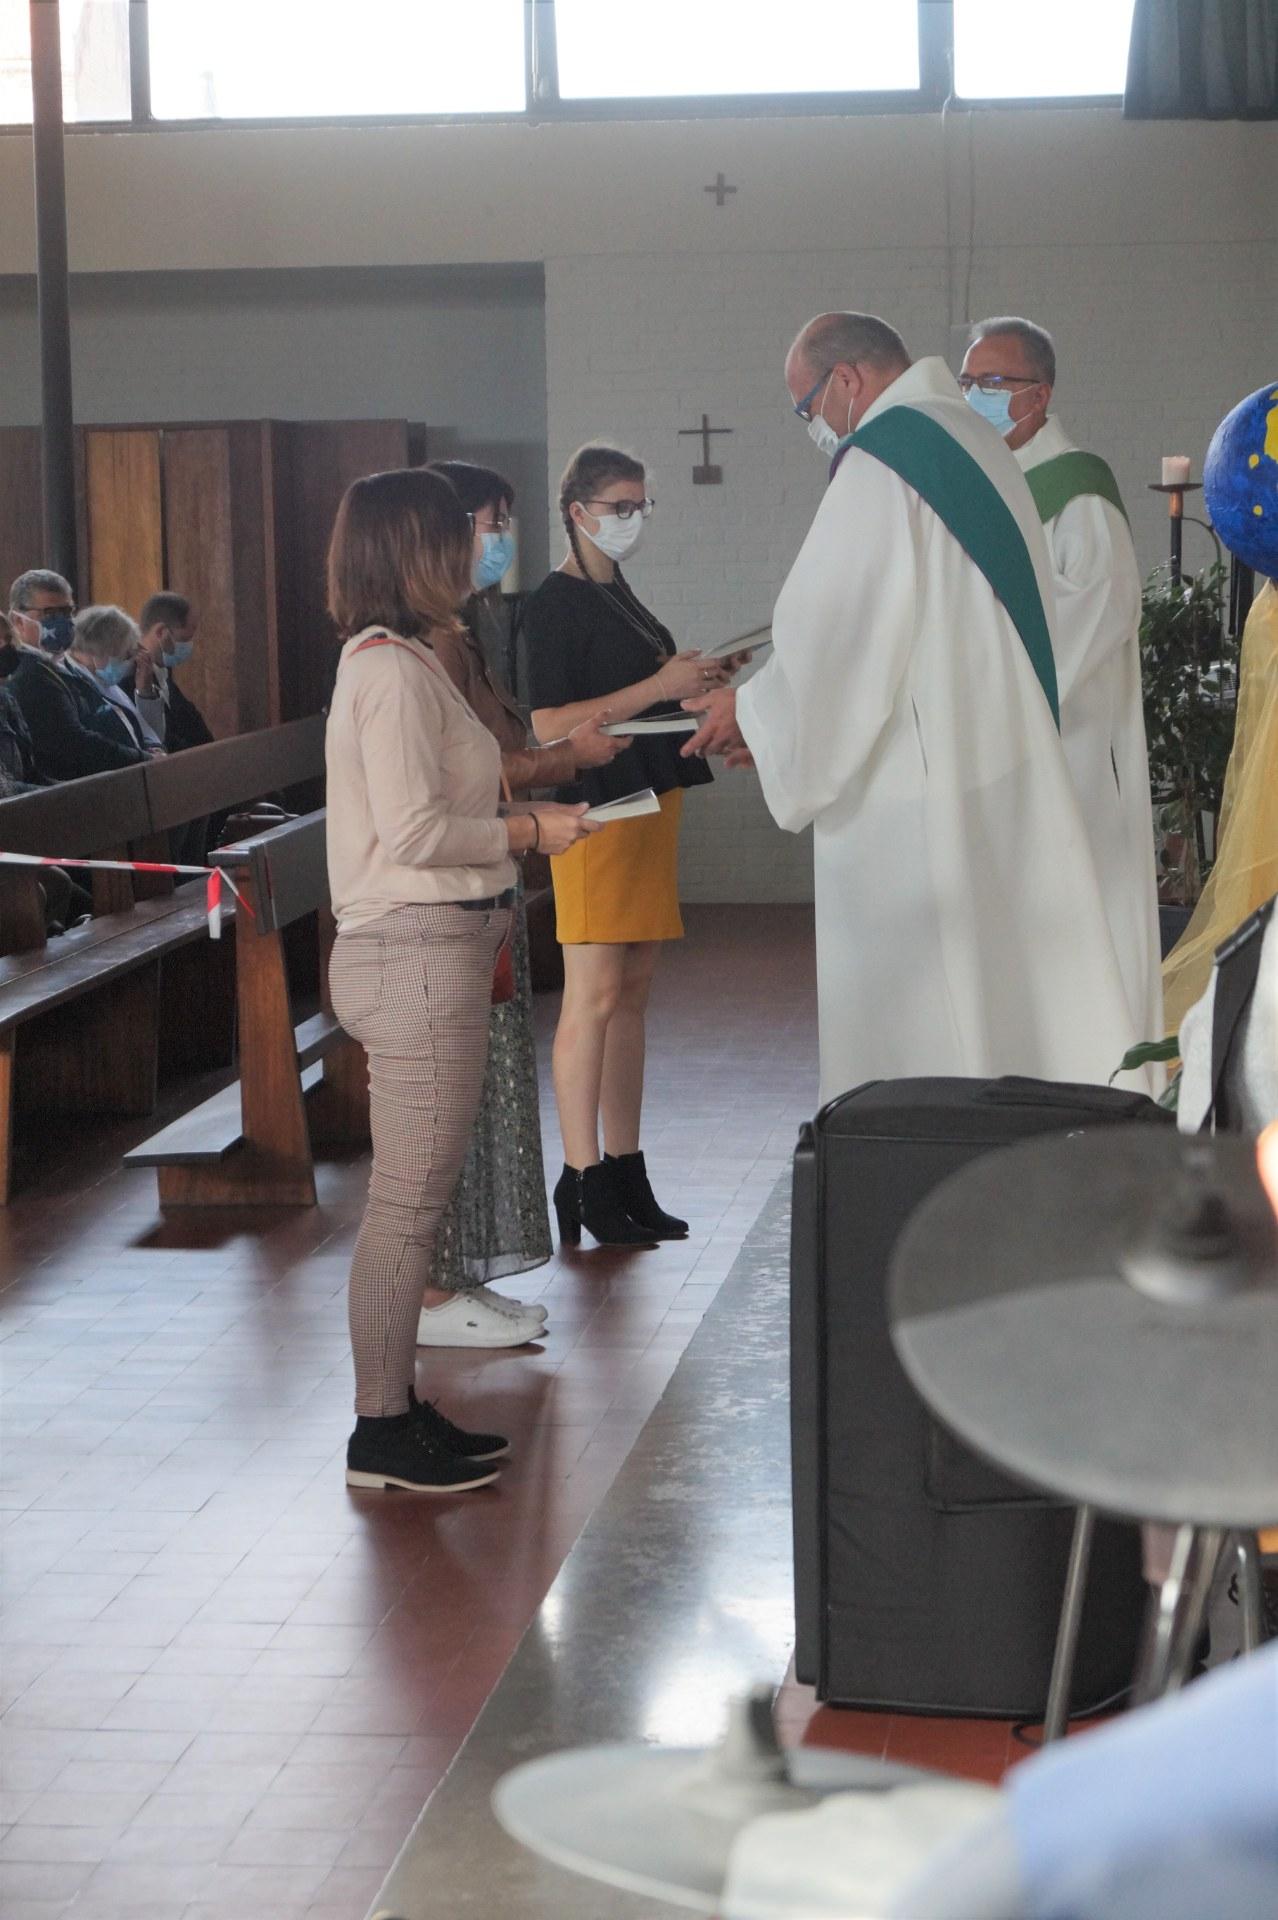 entree en catechumenat 6 sept 2020 (39)